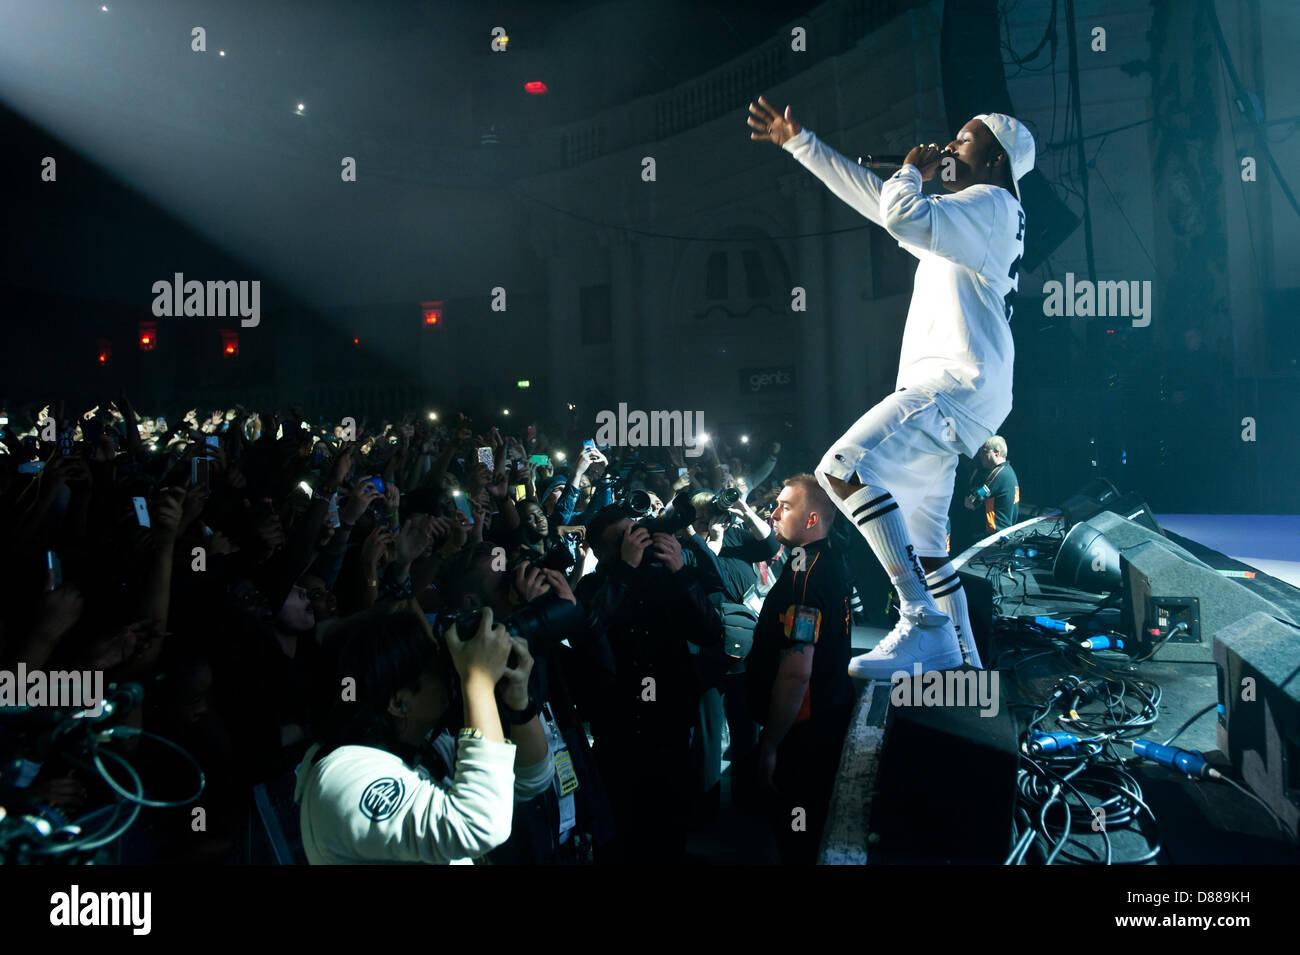 London, UK. 21st May 2013.  A$AP Rocky performs live at O2 Academy Brixton. Credit:  Piero Cruciatti / Alamy Live Stock Photo